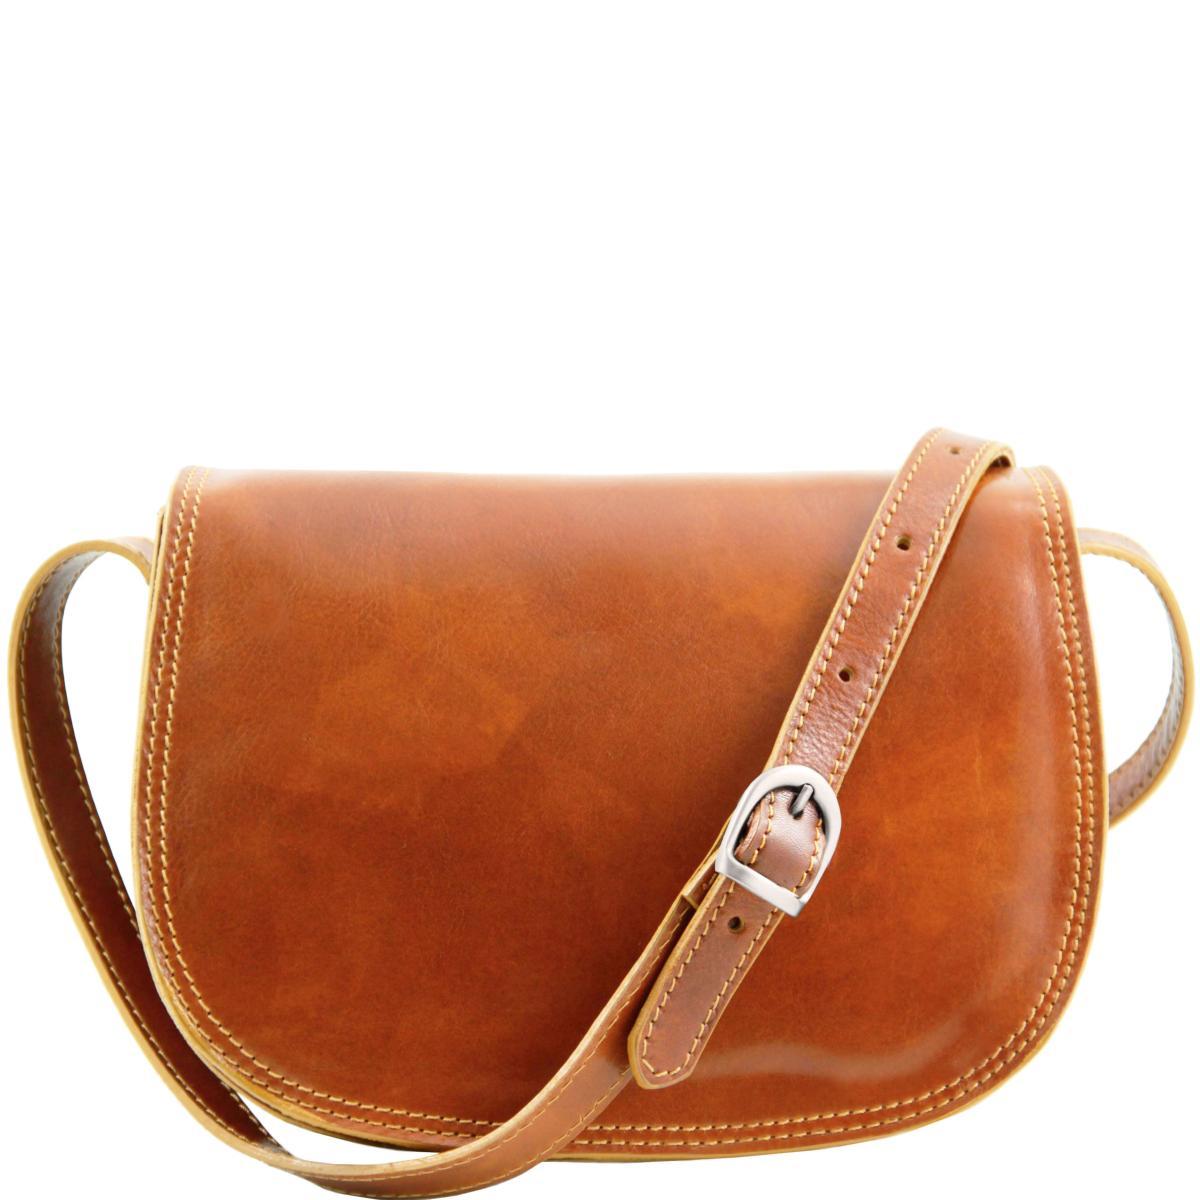 Sac Bandoulière Cuir Femme Camel - Tuscany Leather -